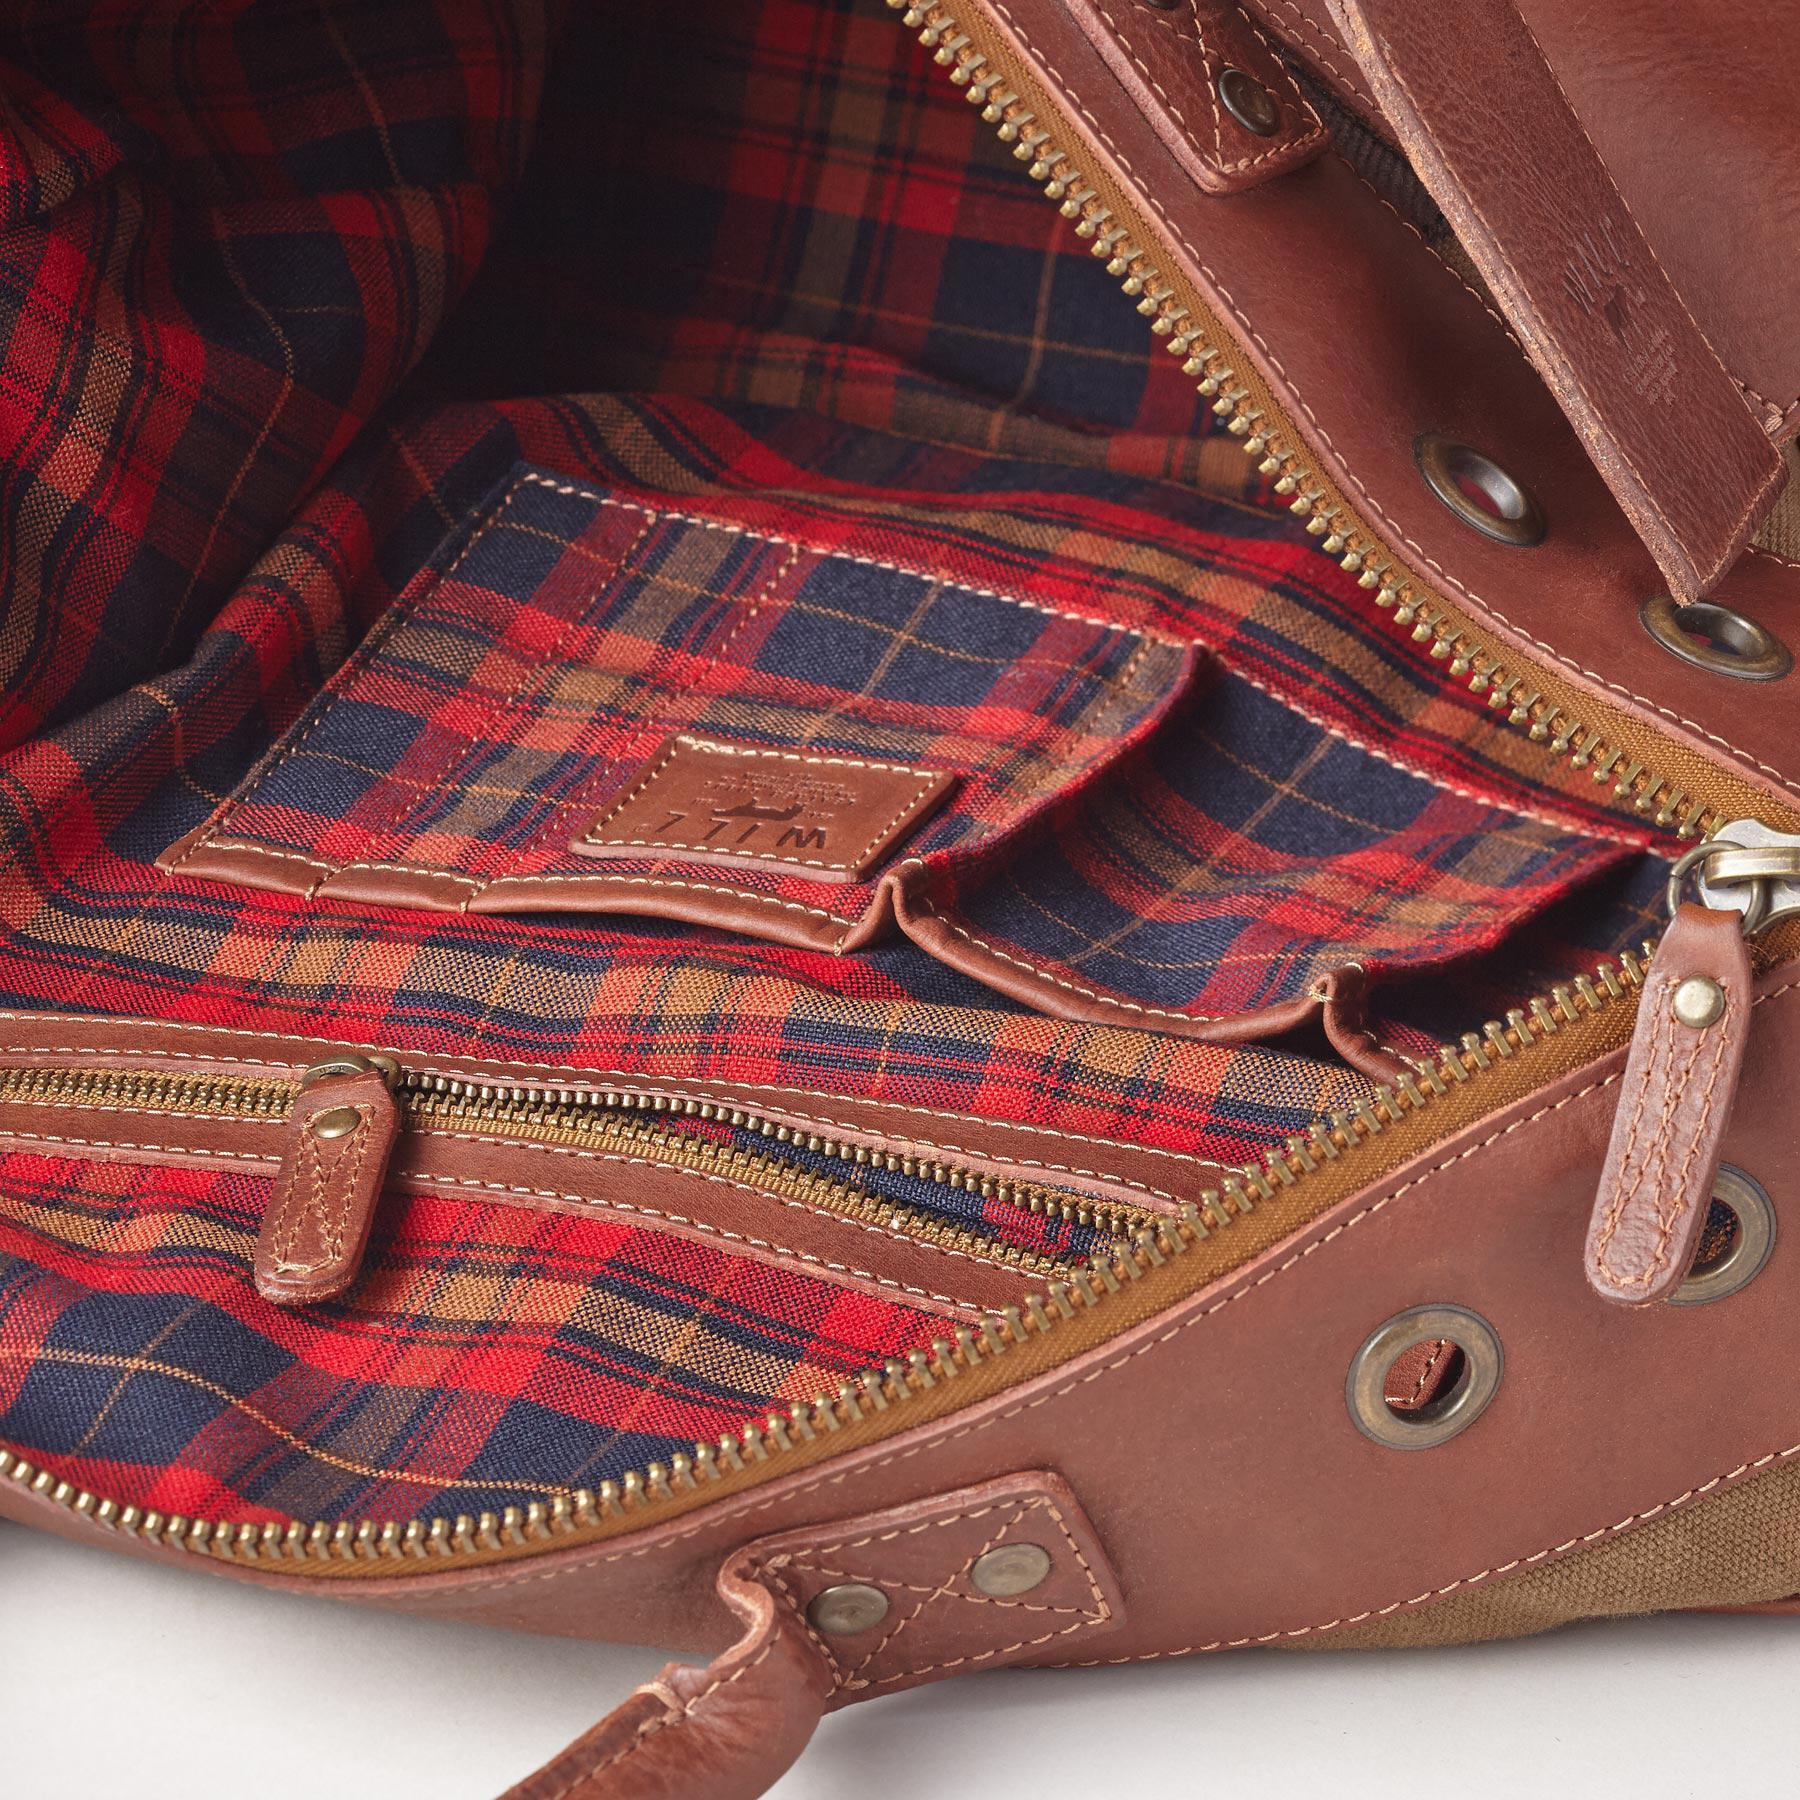 Venerations Duffle Bag: View 3